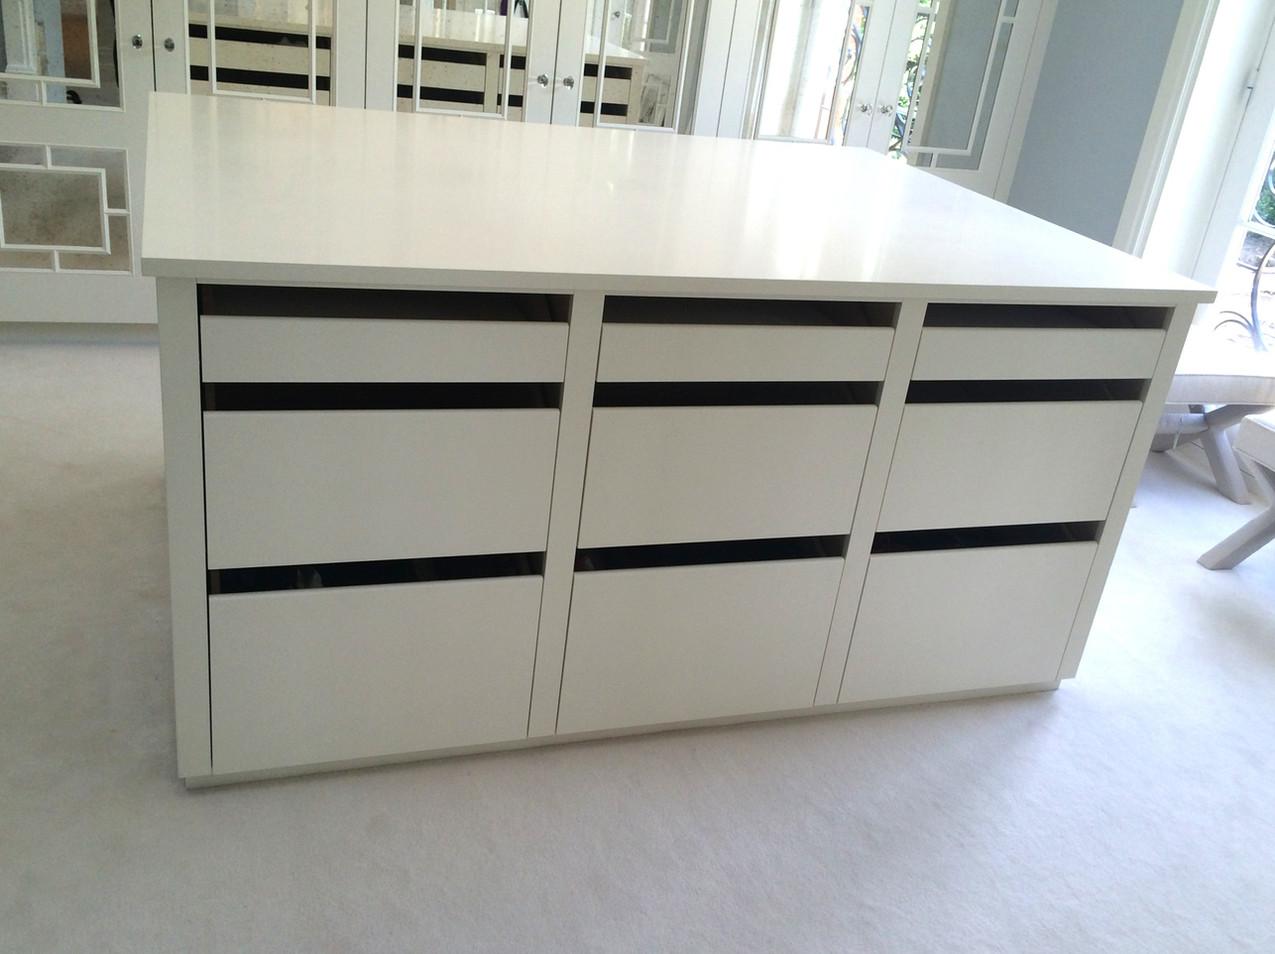 Dressing room island storage with drawers Interior designer - Northwick Design